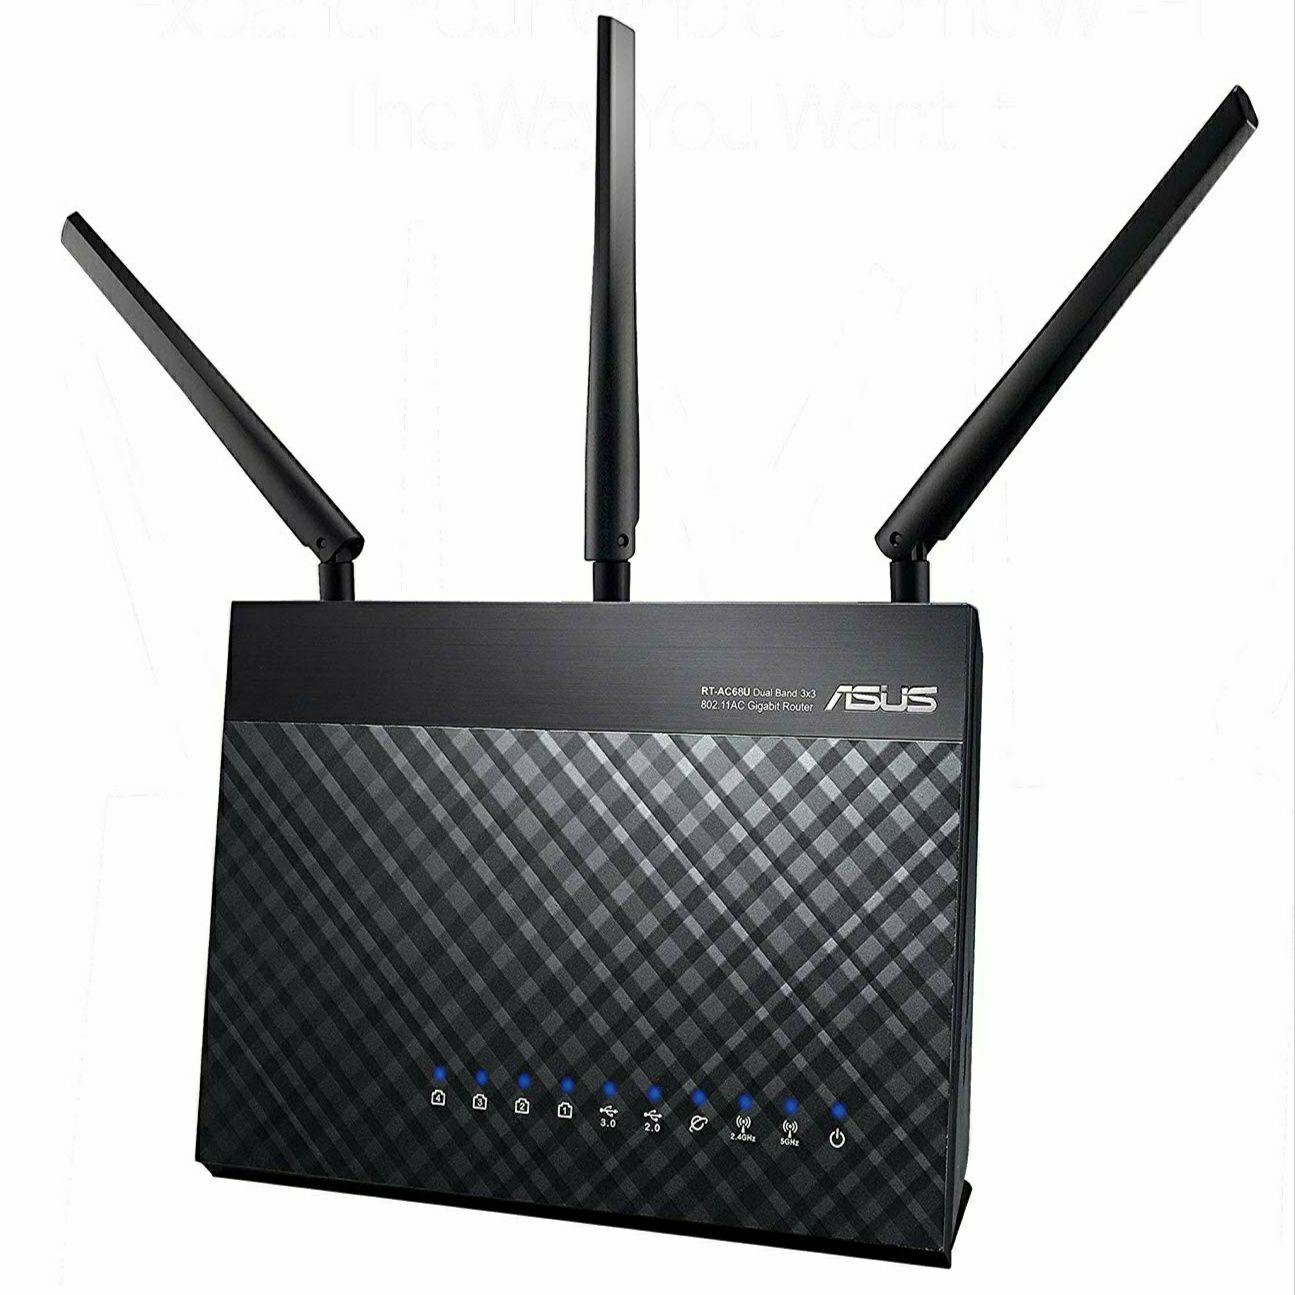 [NL Grenzgänger] Asus RT-AC68U Router (Mesh WLAN System, WiFi 5 AC1900, 4x Gigabit LAN, App Steuerung, Multifunktion-USB 3.0)